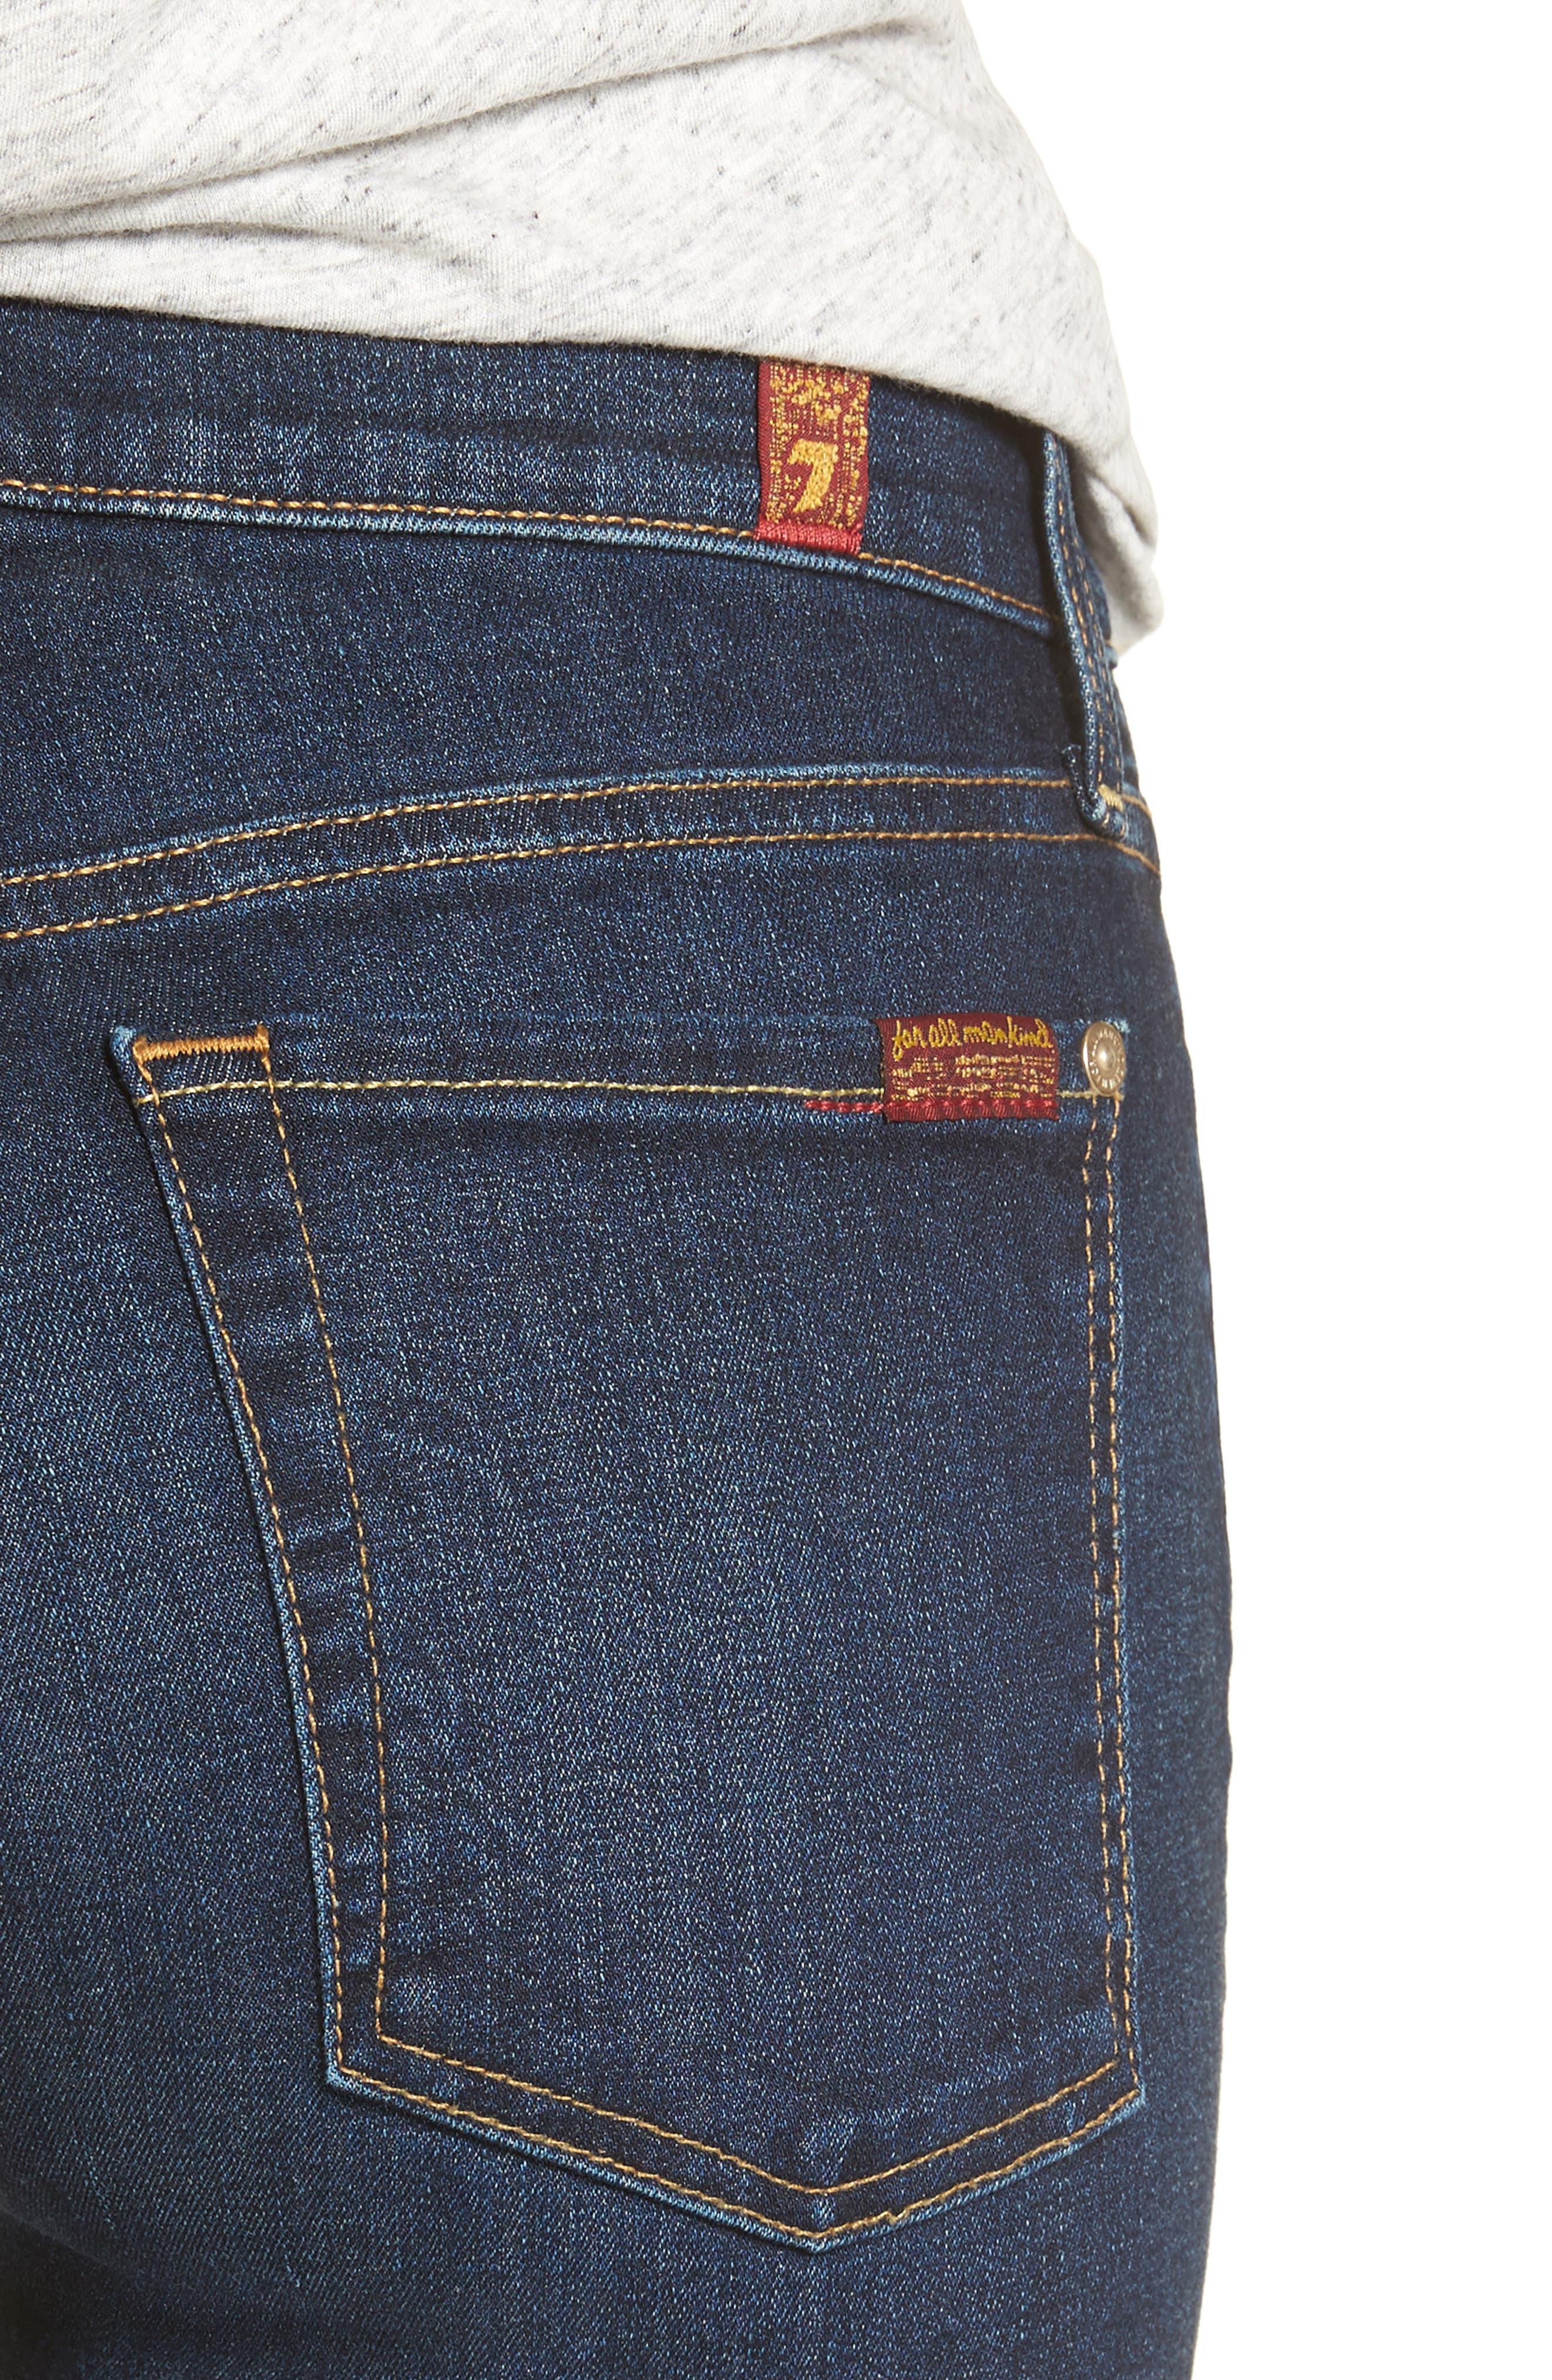 Skinny Jeans,                             Alternate thumbnail 4, color,                             401